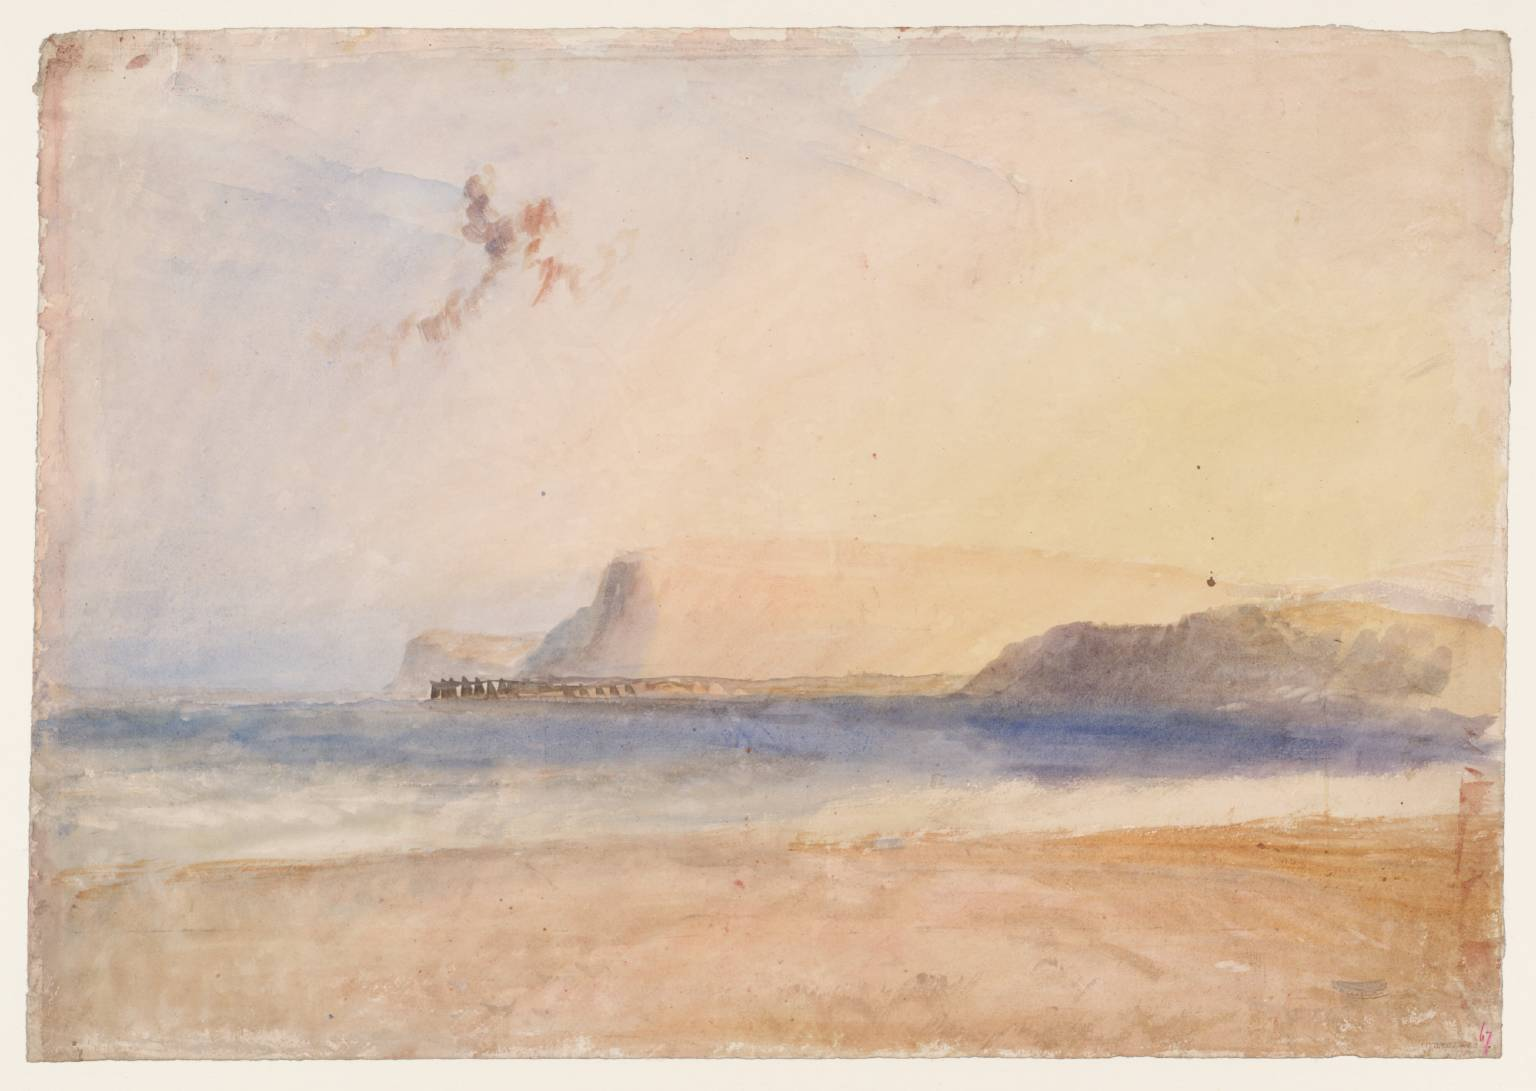 JMW Turner: watercolour study Dorset (date unknown)